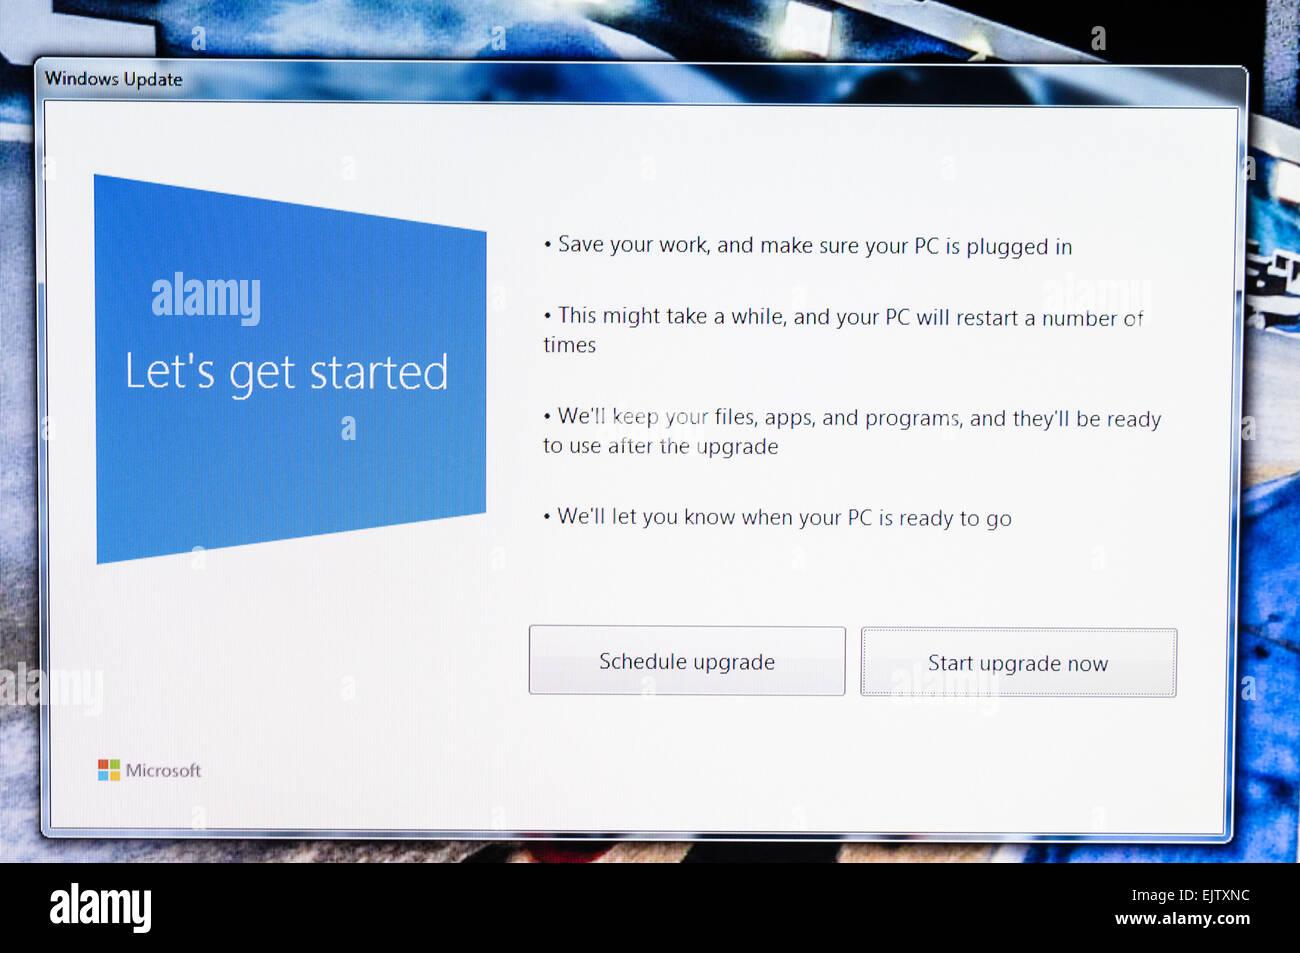 Installing Windows 10.. - Stock Image